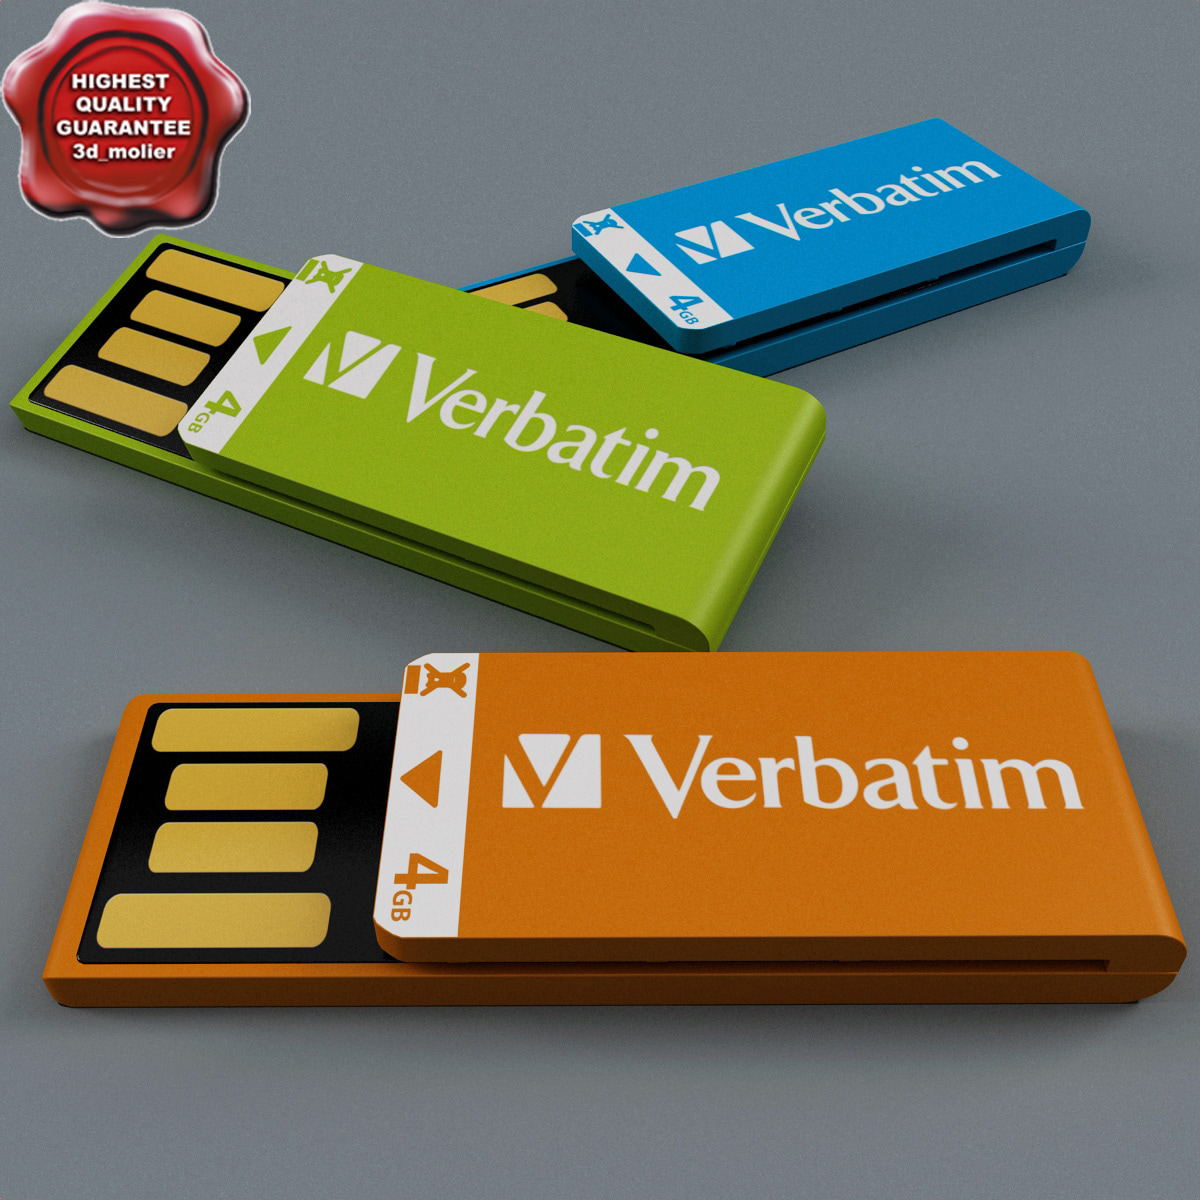 Flash_Drive_Verbatim_00.jpg